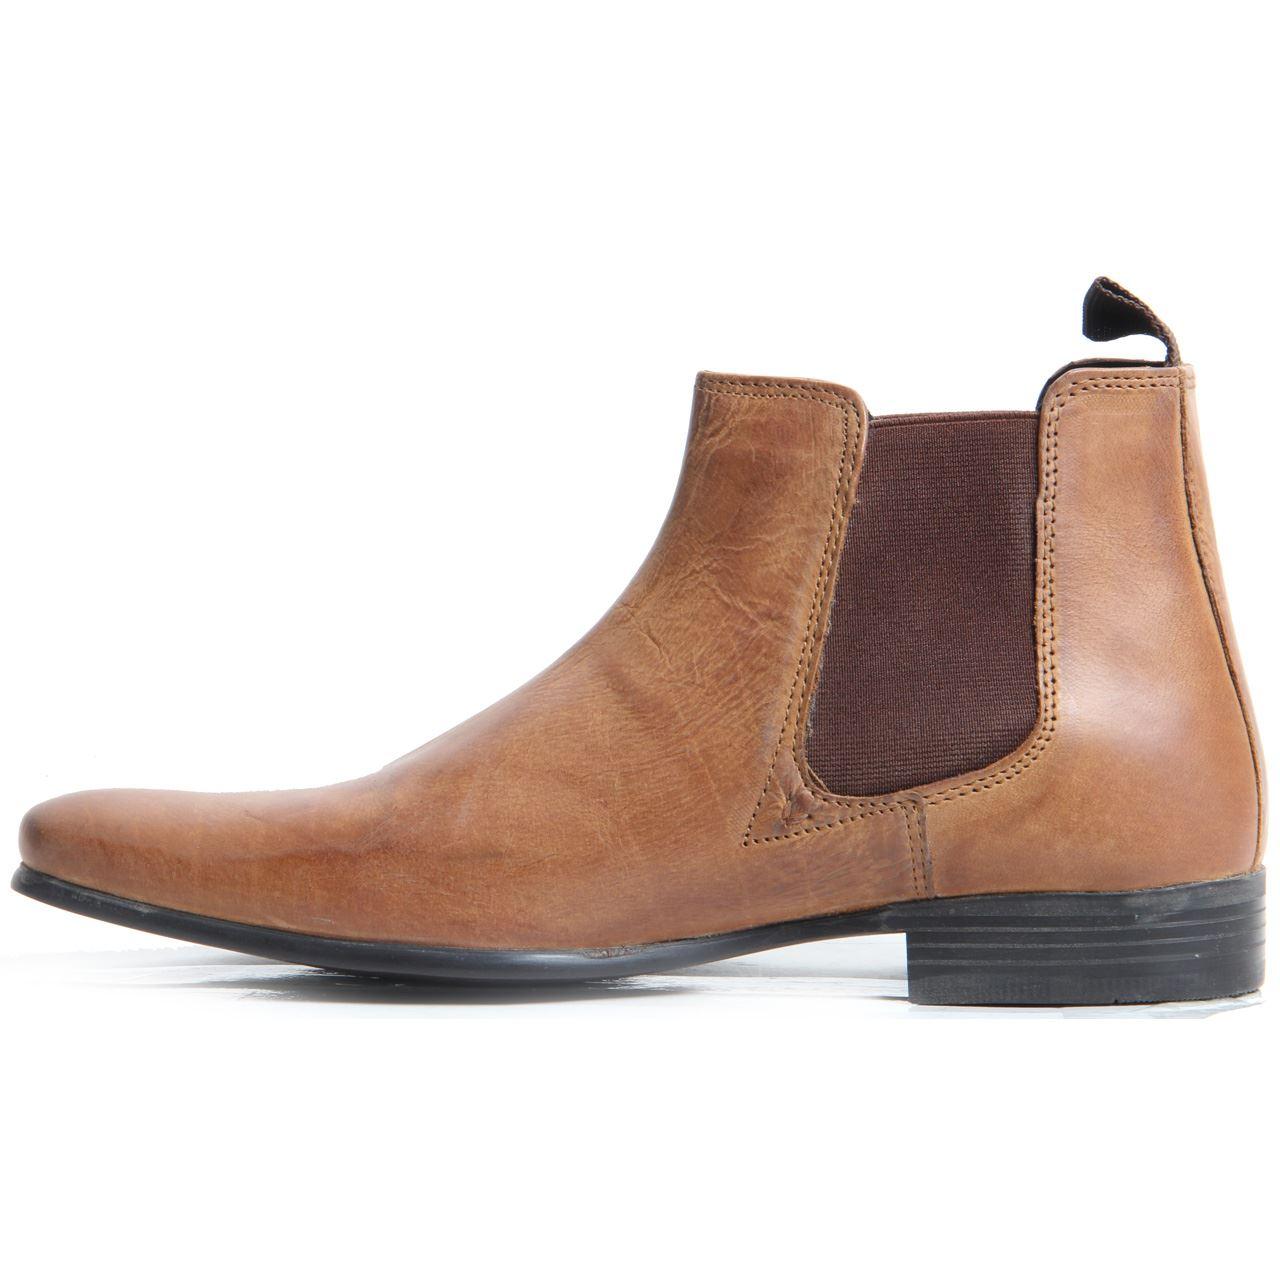 Mens Gentleman Genuine Leather Slip On Smart Casual Chelsea Boots ...